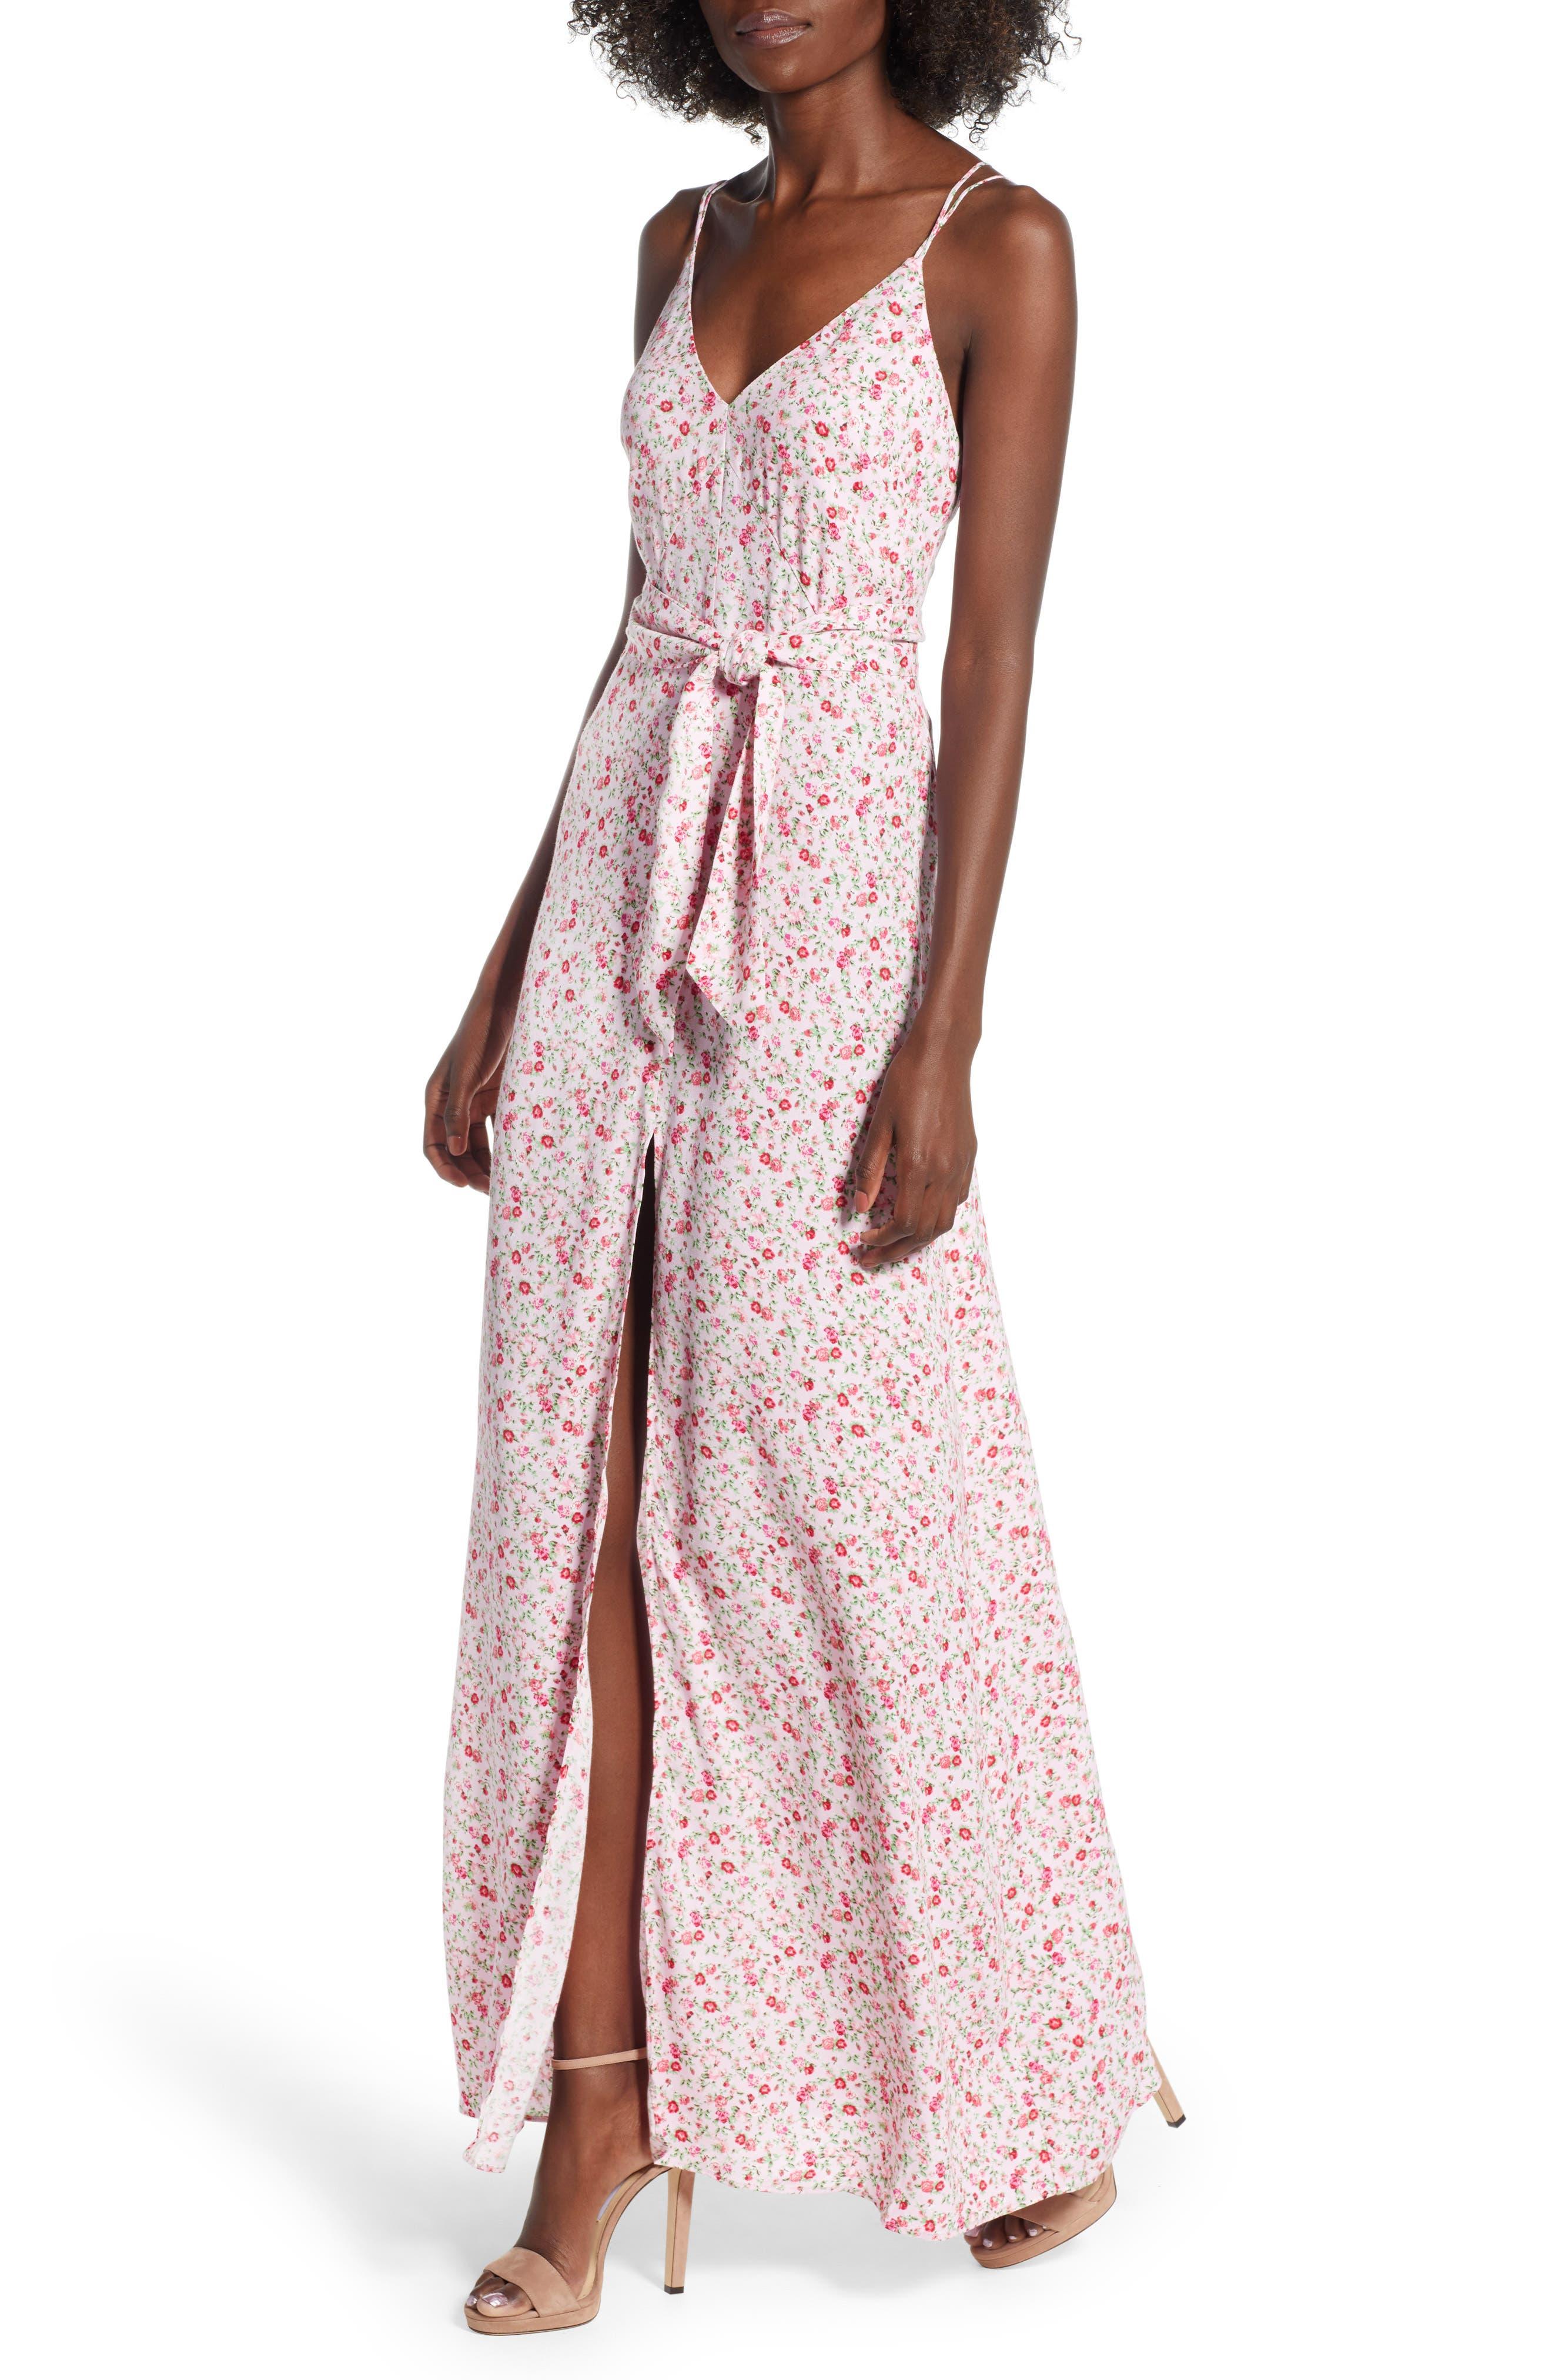 Diego Maxi Dress,                             Main thumbnail 1, color,                             BABY PINK DITSY